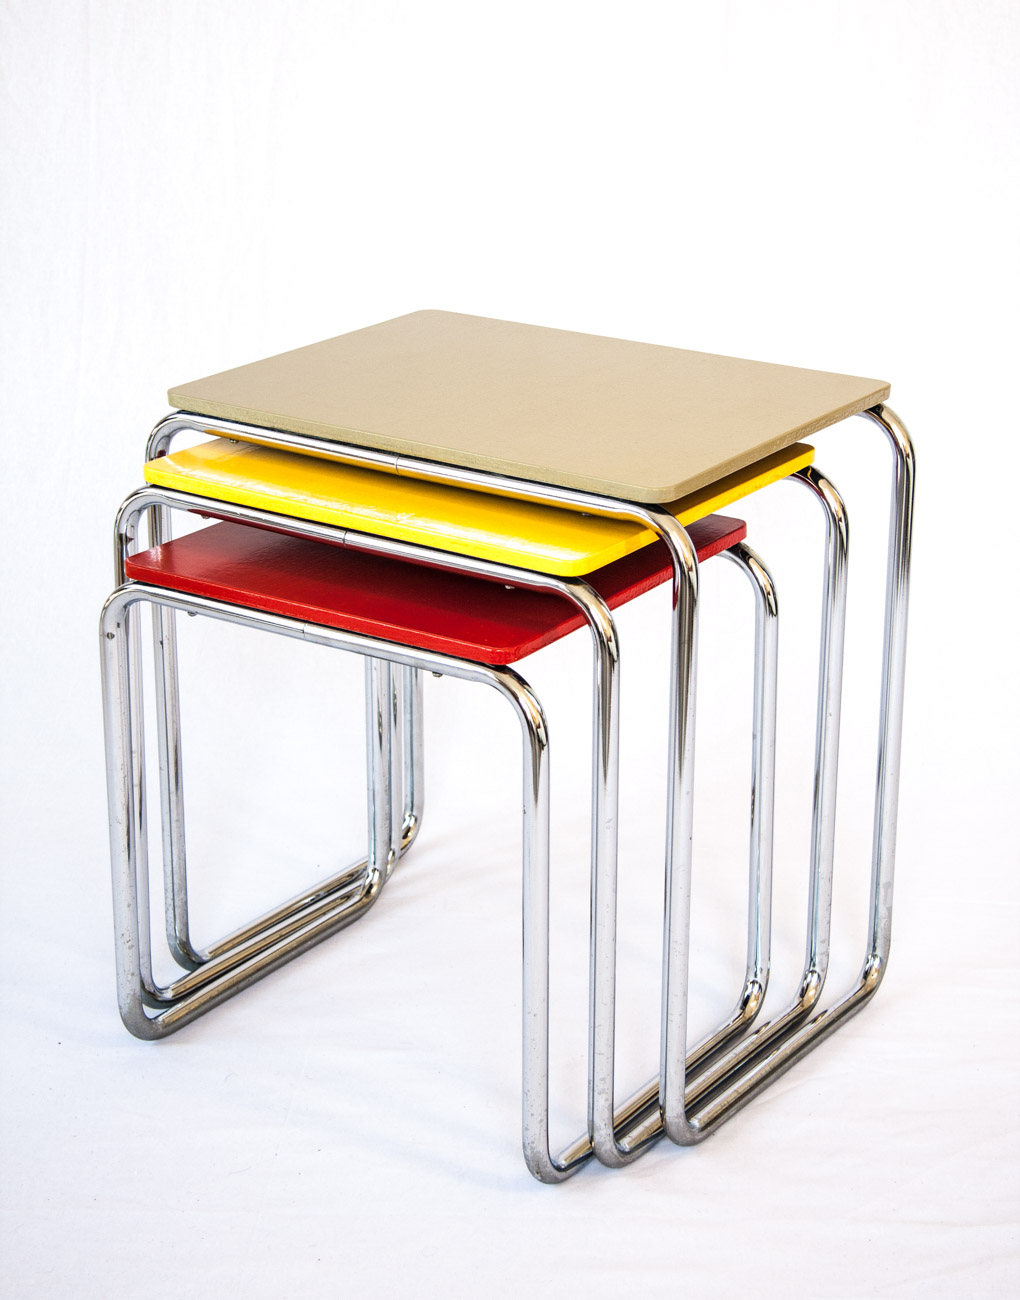 Set Nesting Tables B9 By Marcel Breuer